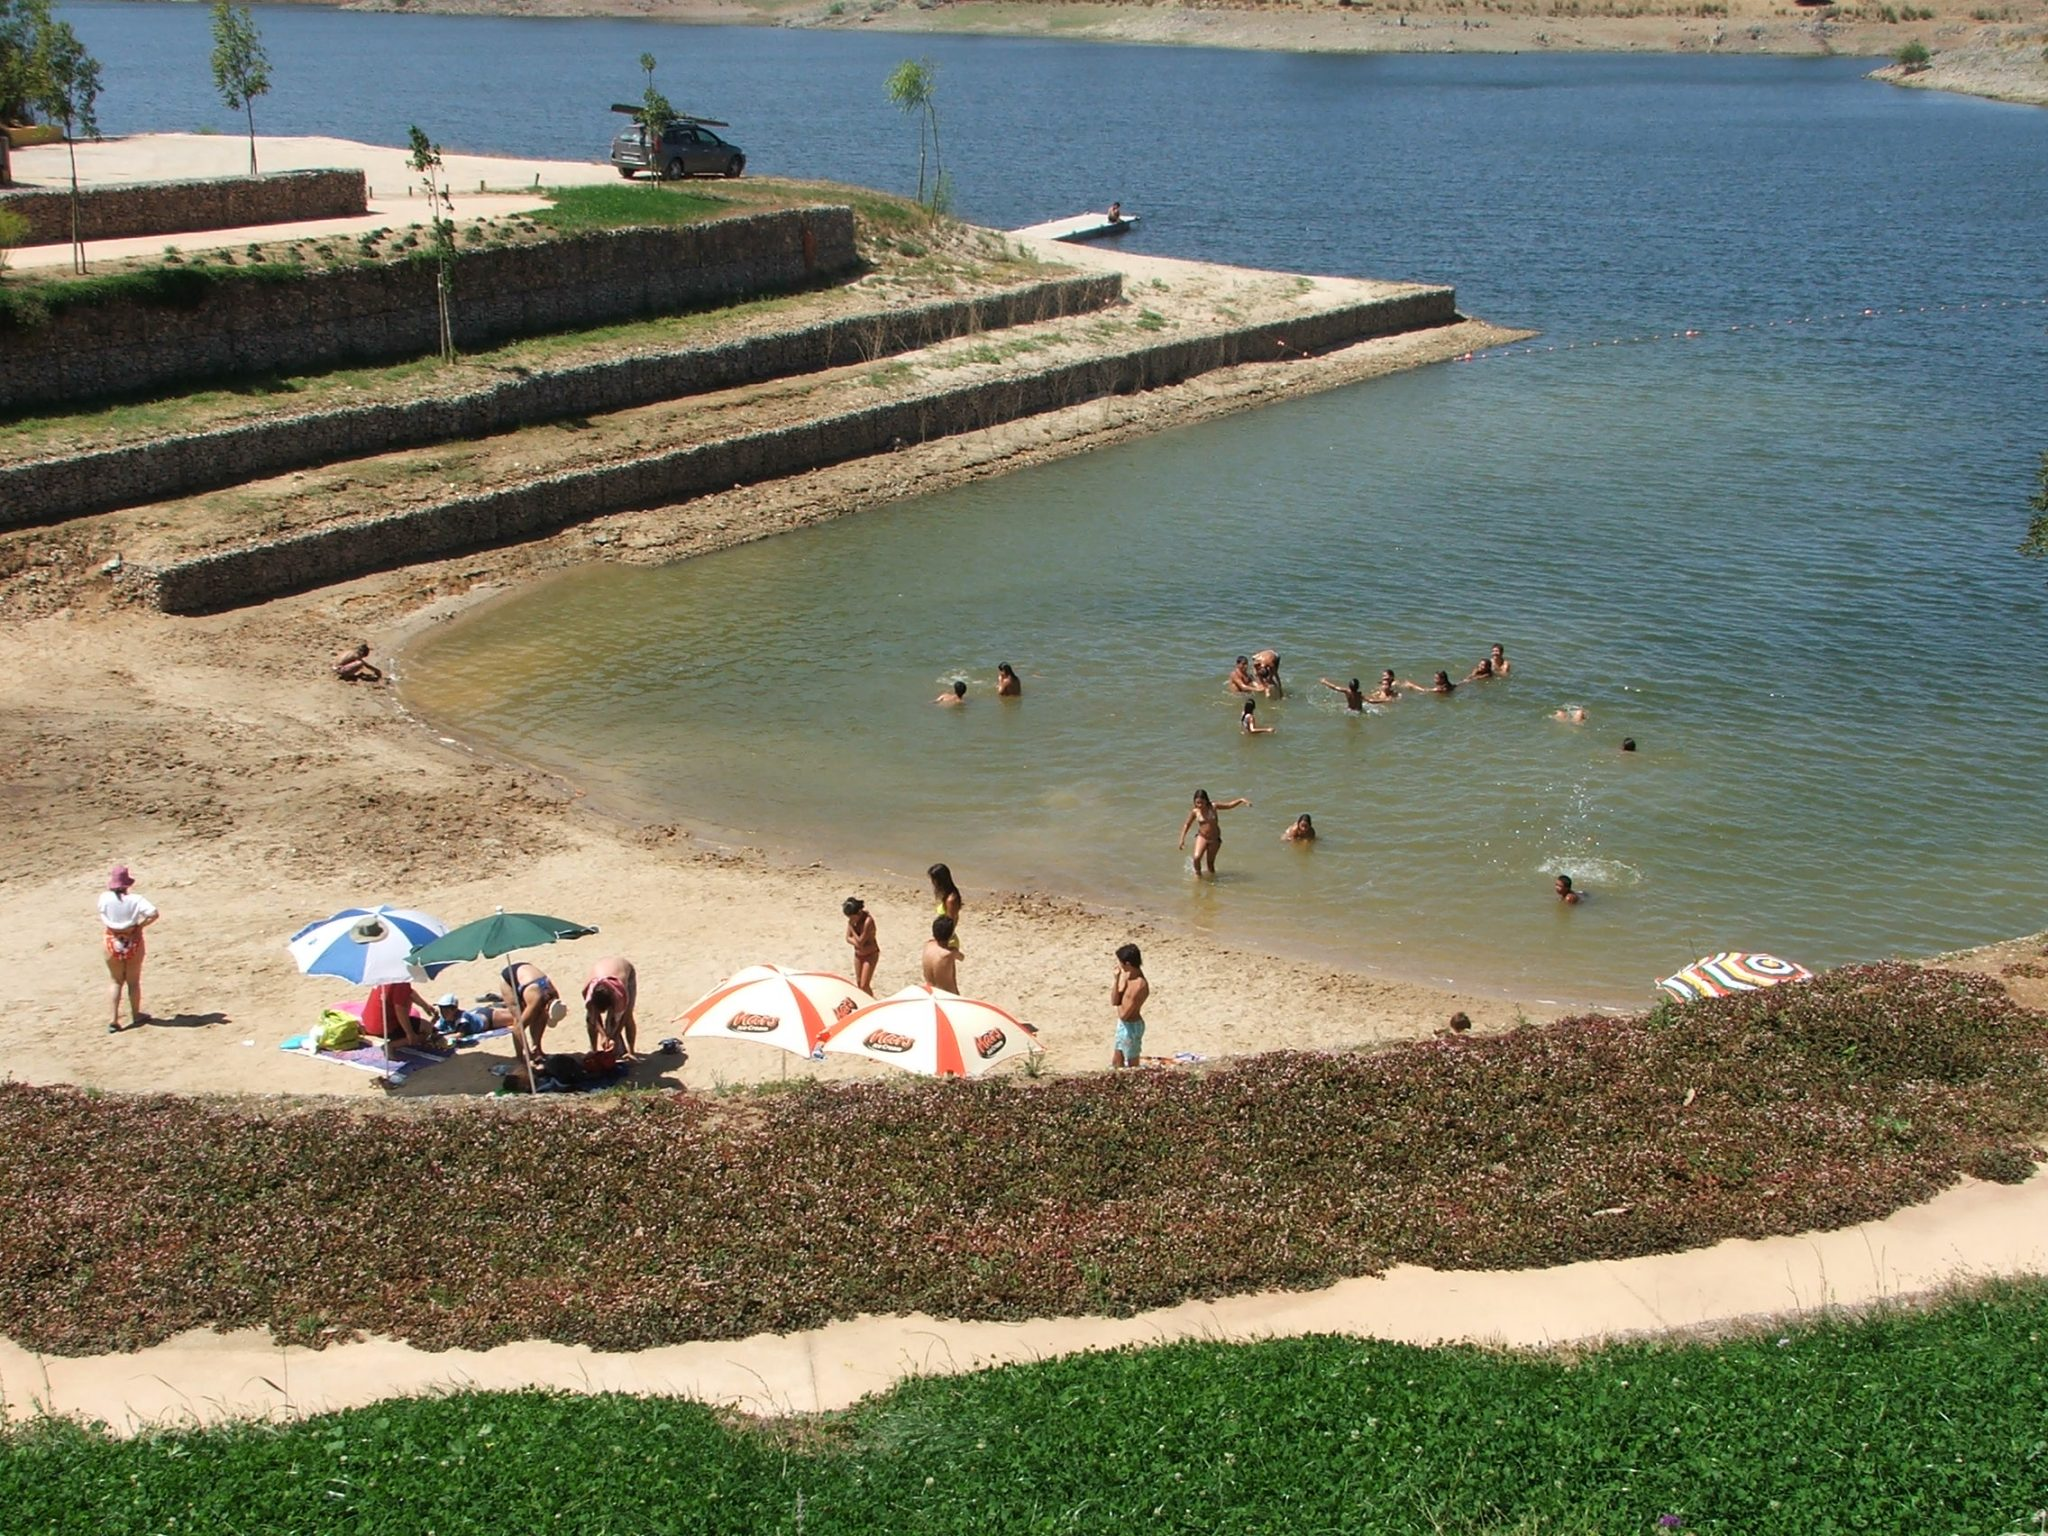 praia fluvial do clube náutico